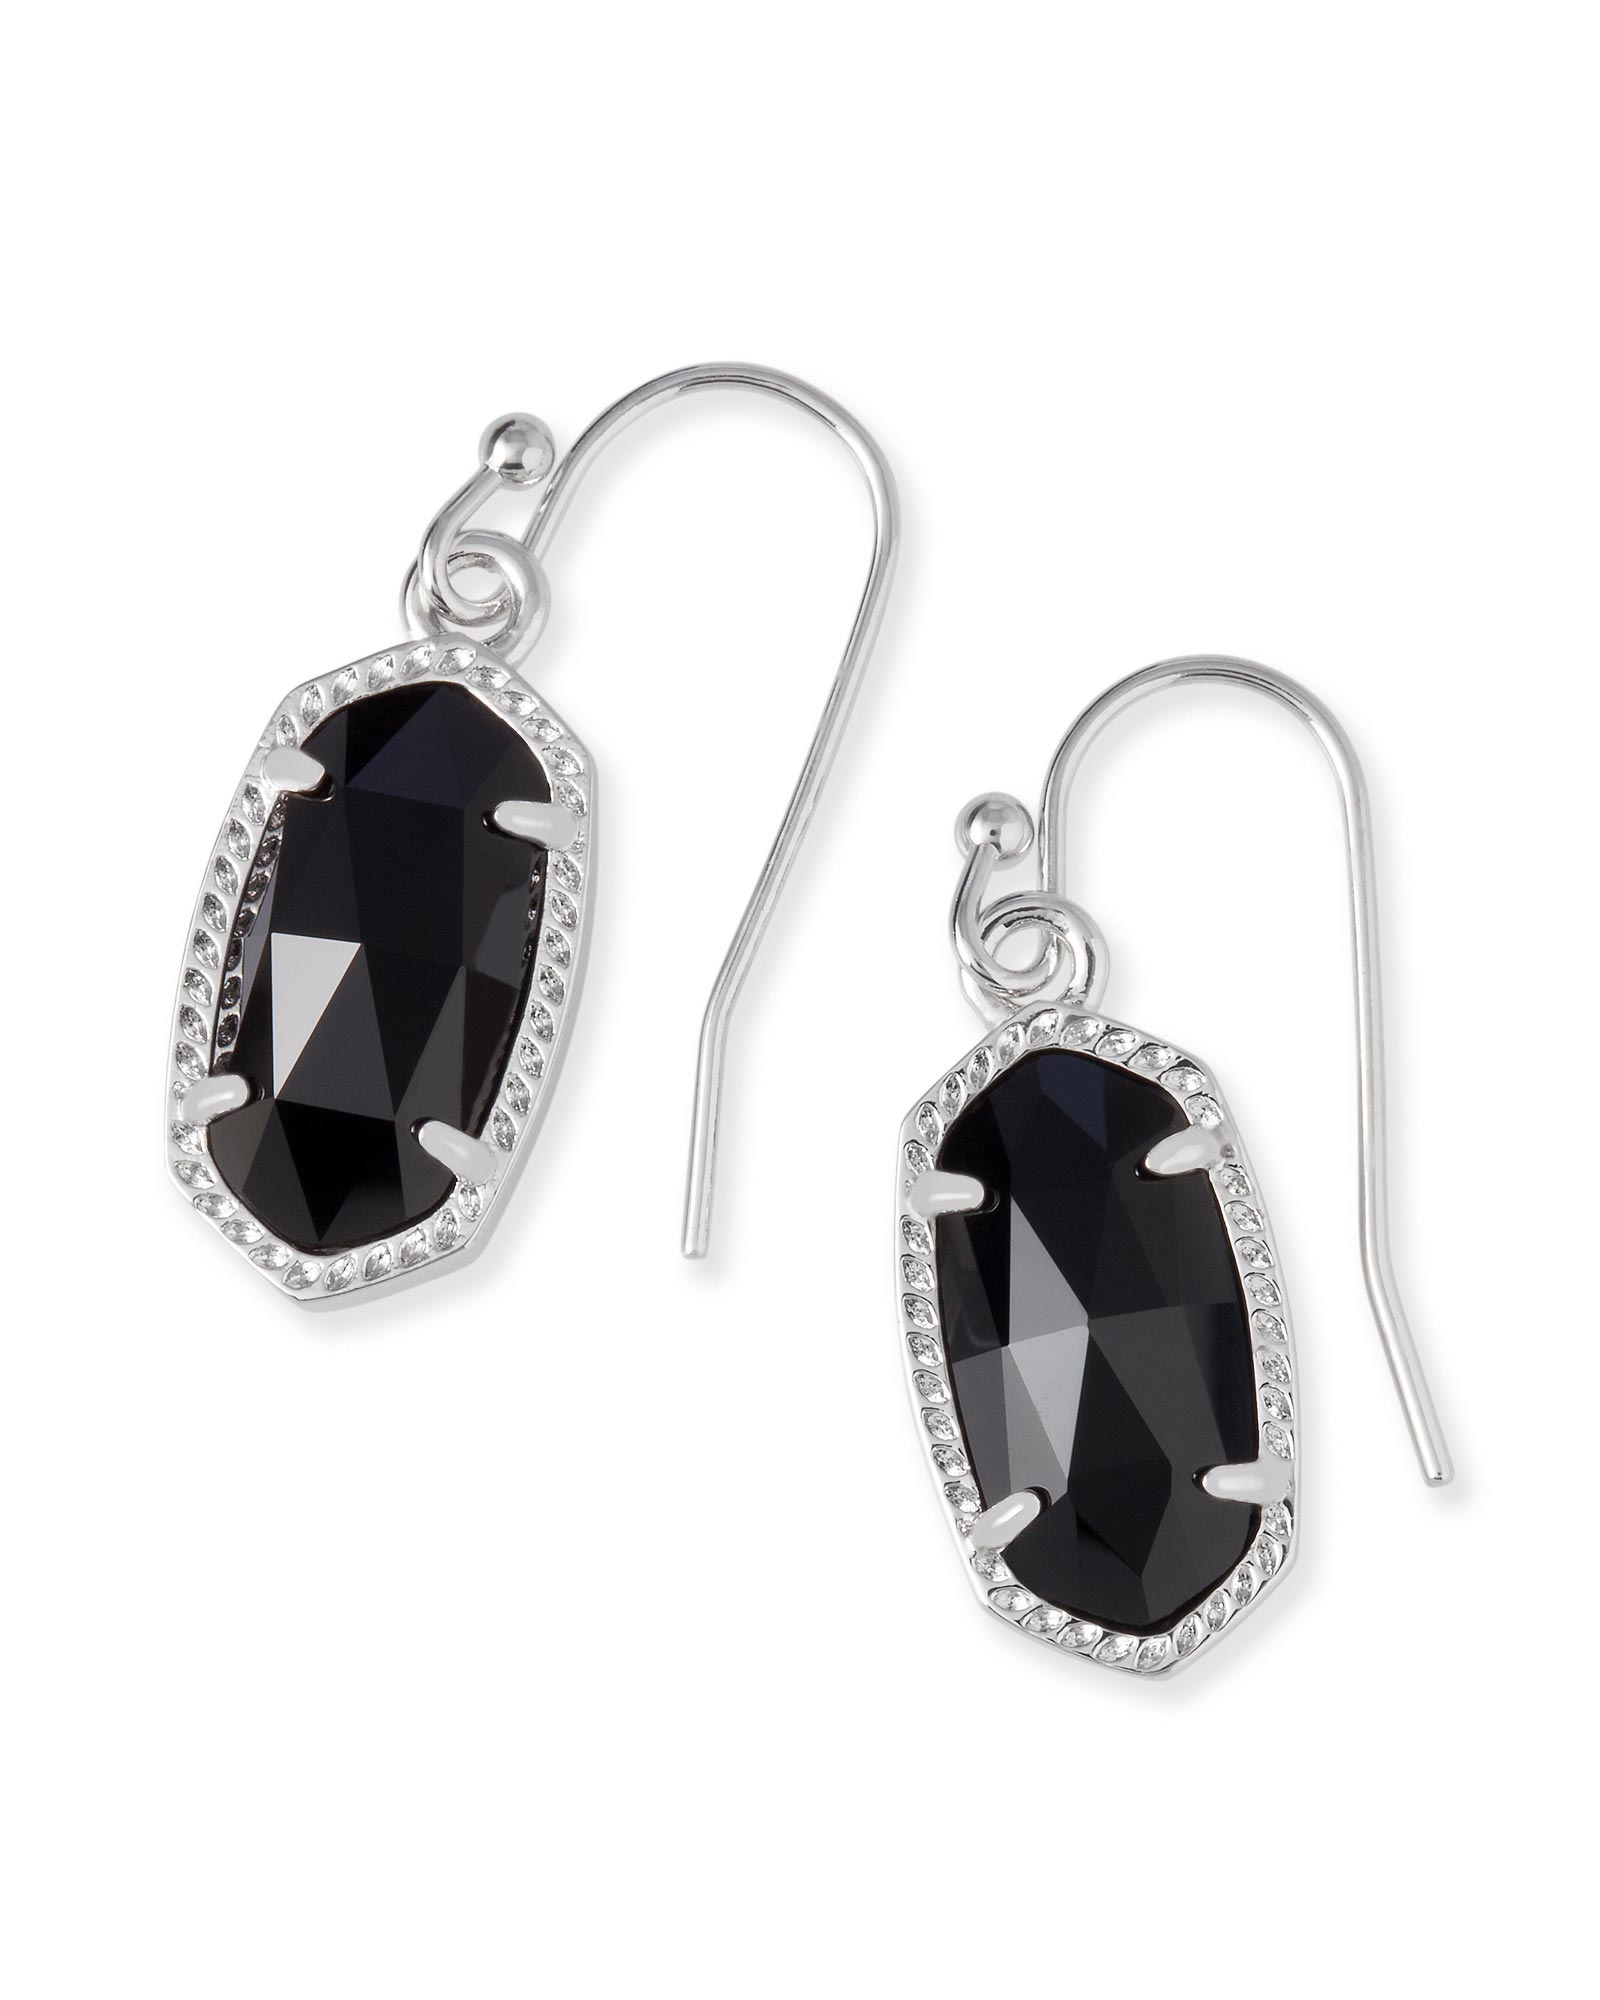 Lee Silver Earrings In Black